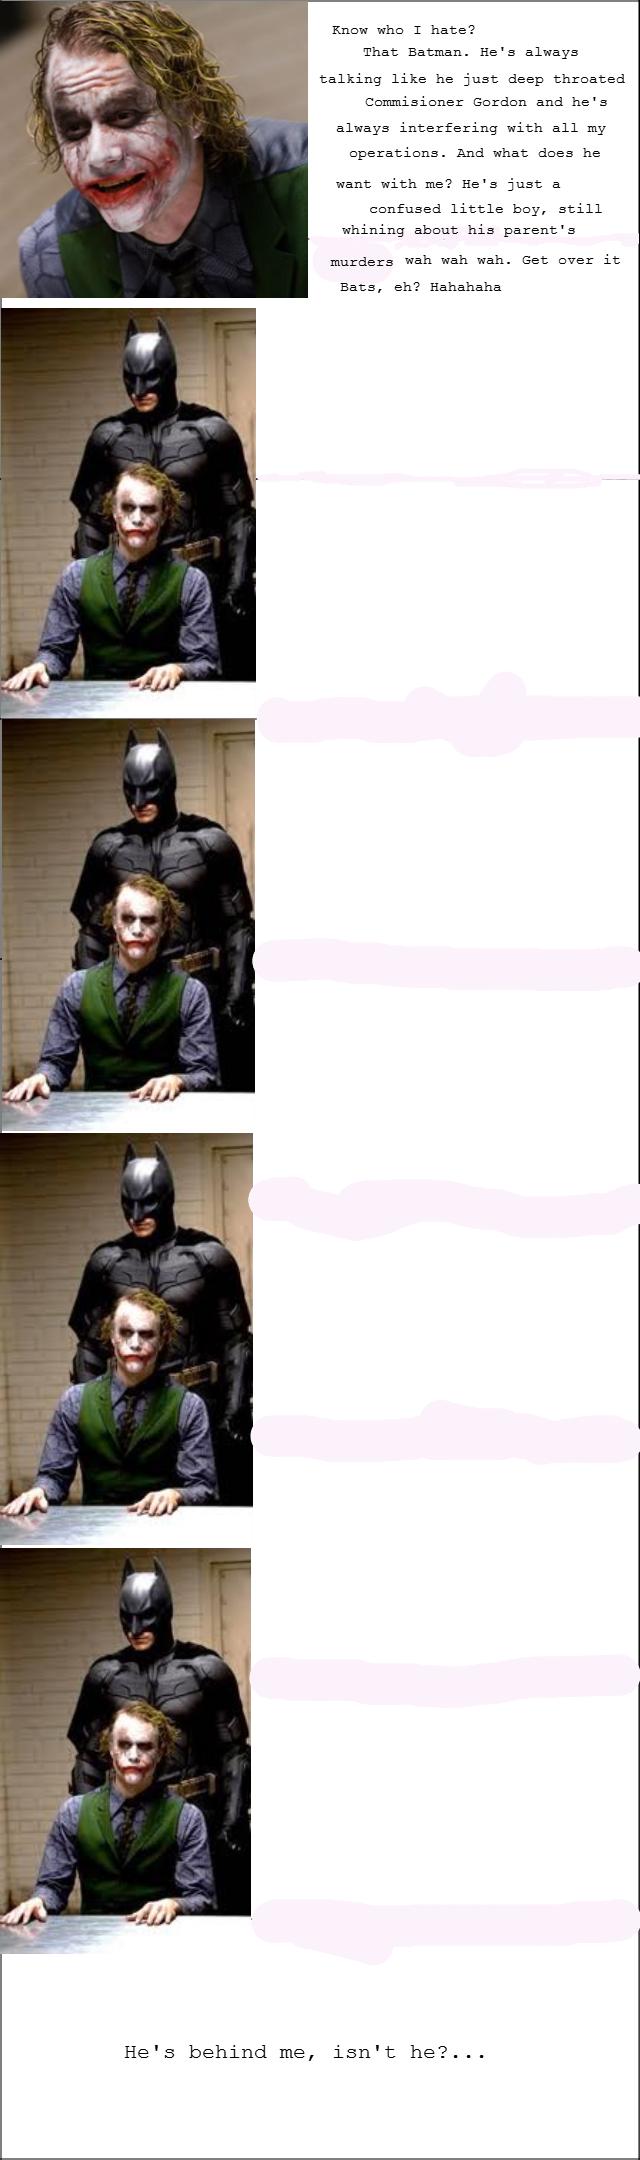 Joker's talking smack about Ol' Bats. ^. He' s behind me, Knew who T hate'? That Batman. He' s always talking like, he just deep threated trr: : srue: tr Eerder Joker's talking smack about Ol' Bats ^ He' s behind me Knew who T hate'? That Batman always like he just deep threated trr: : srue: tr Eerder